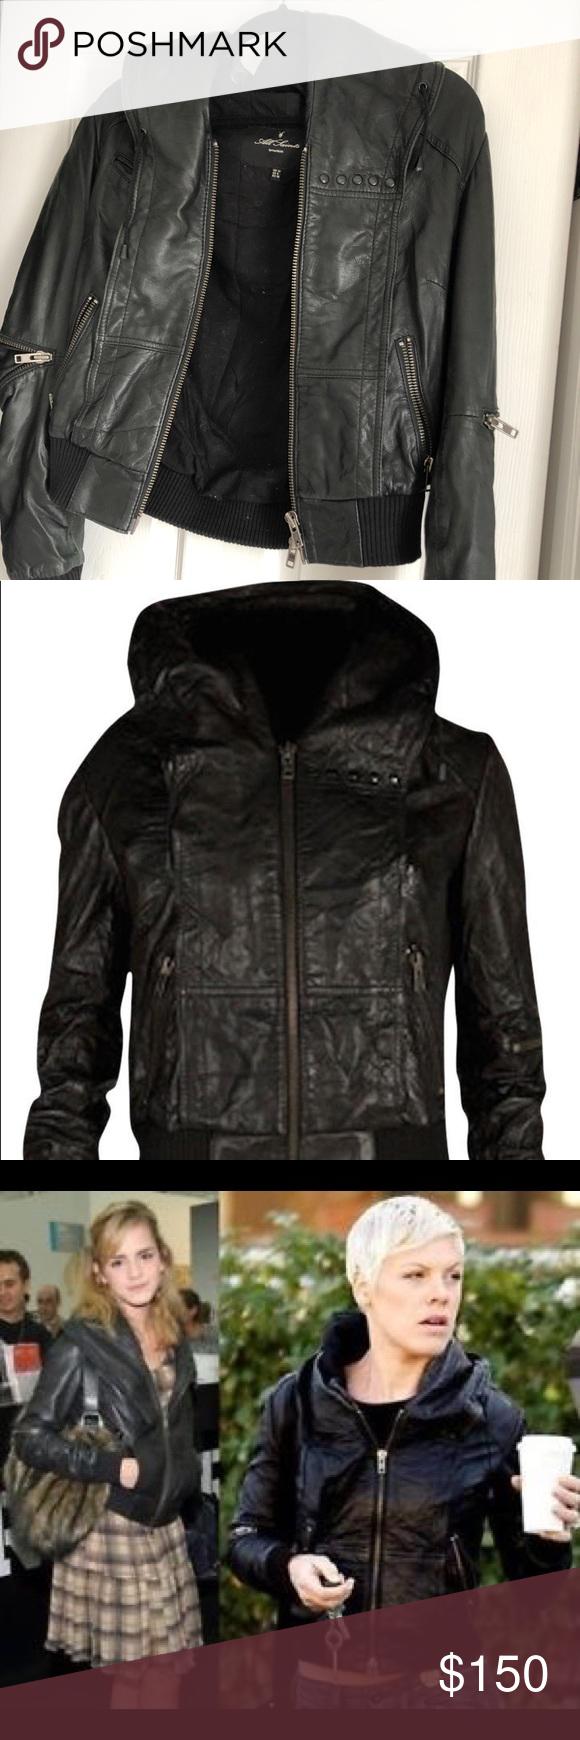 68728cc60 Allsaints cobra hooded leather bomber jacket Allsaints black cobra ...